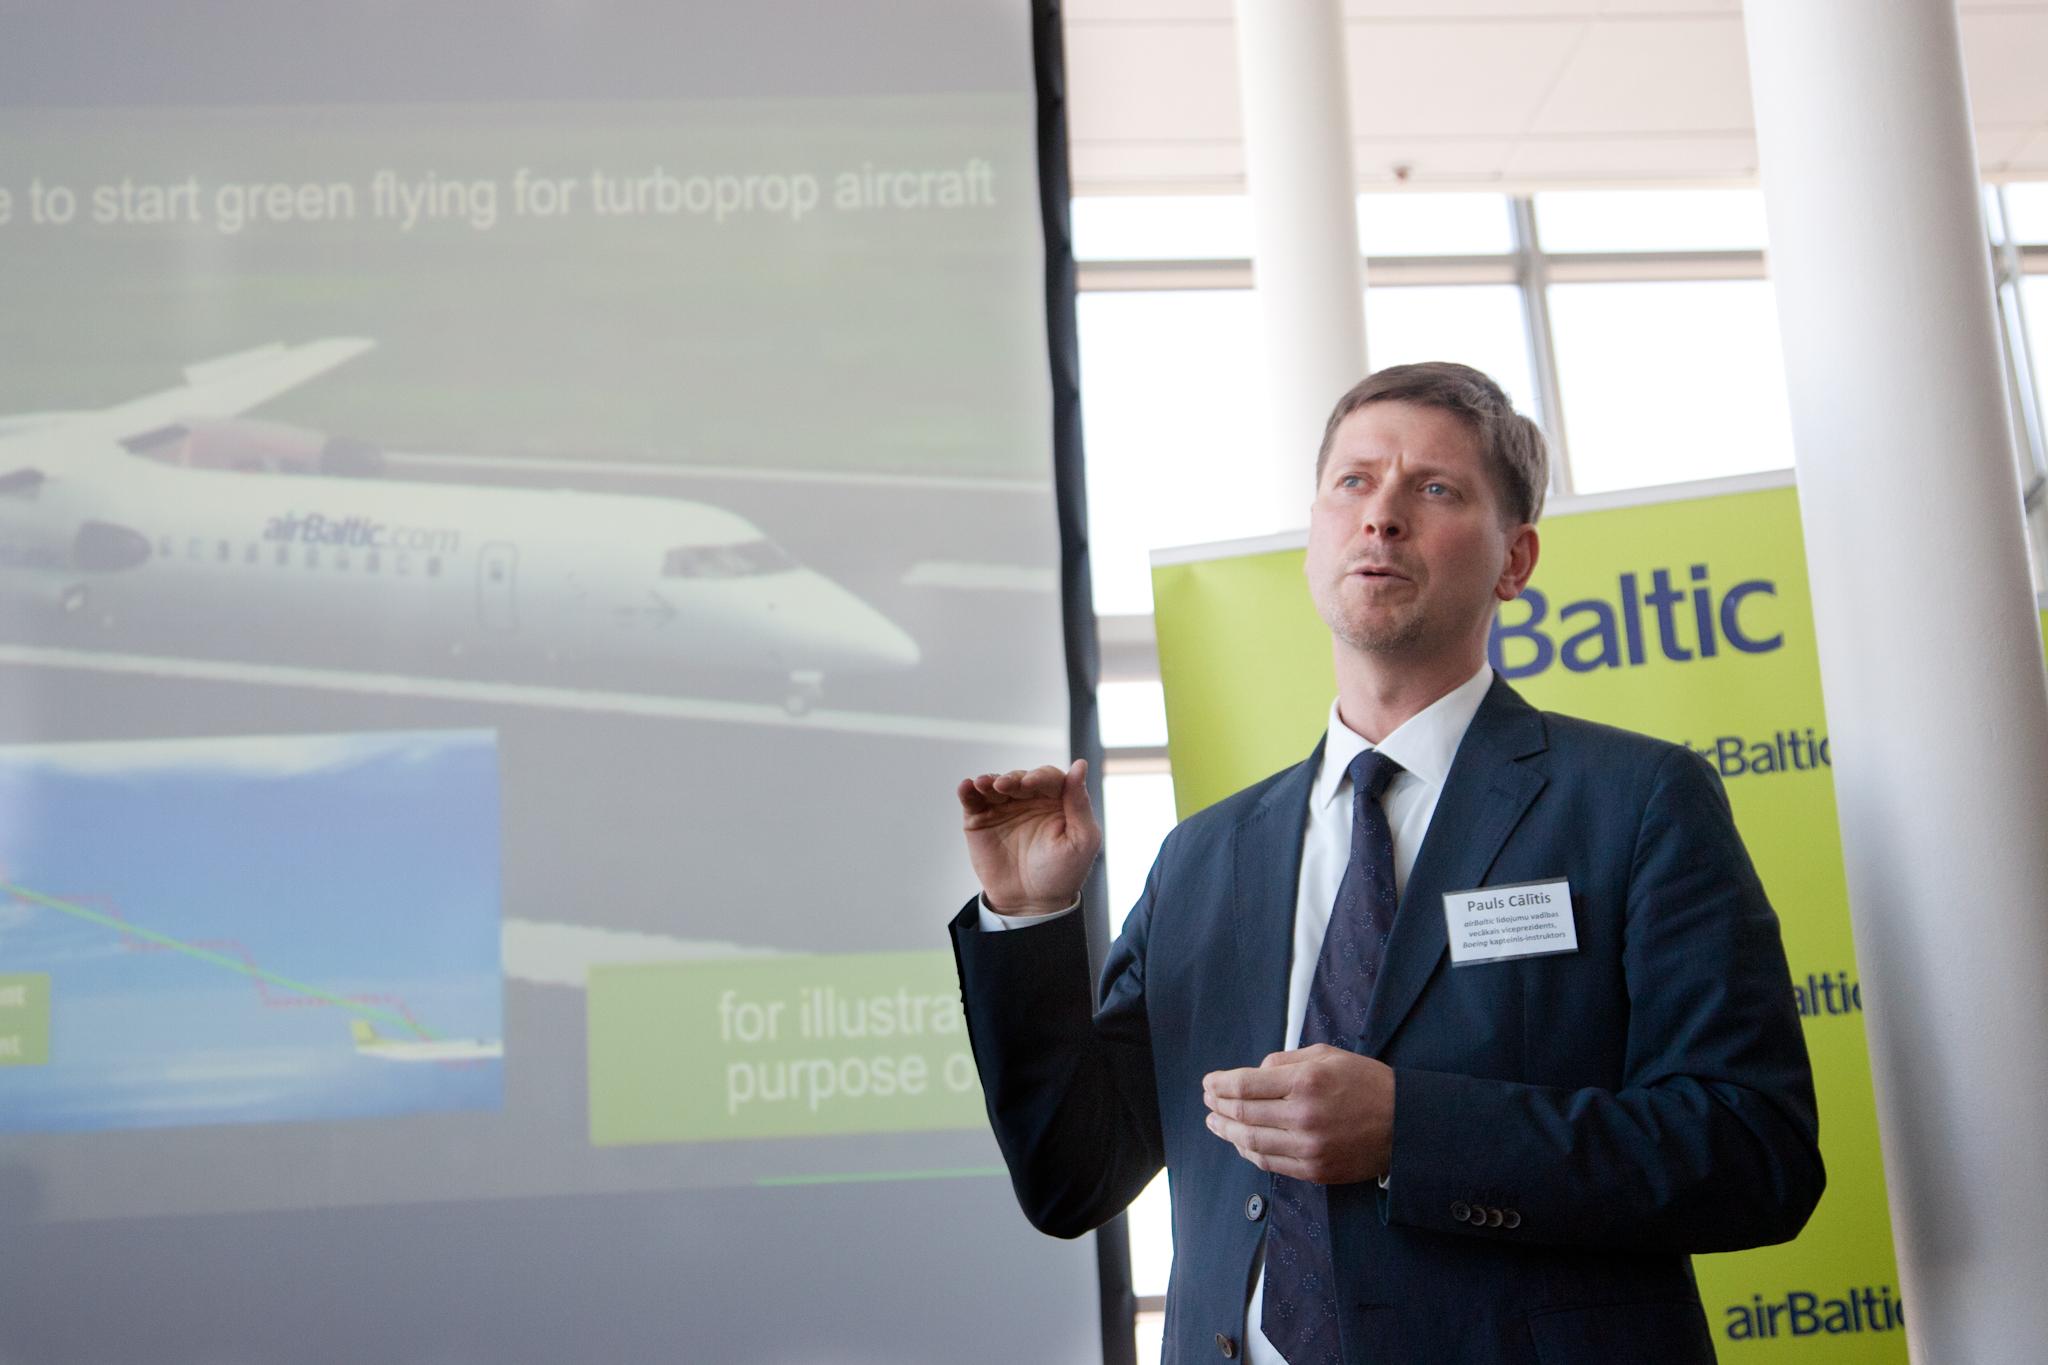 airBaltic_Pauls_Calitis